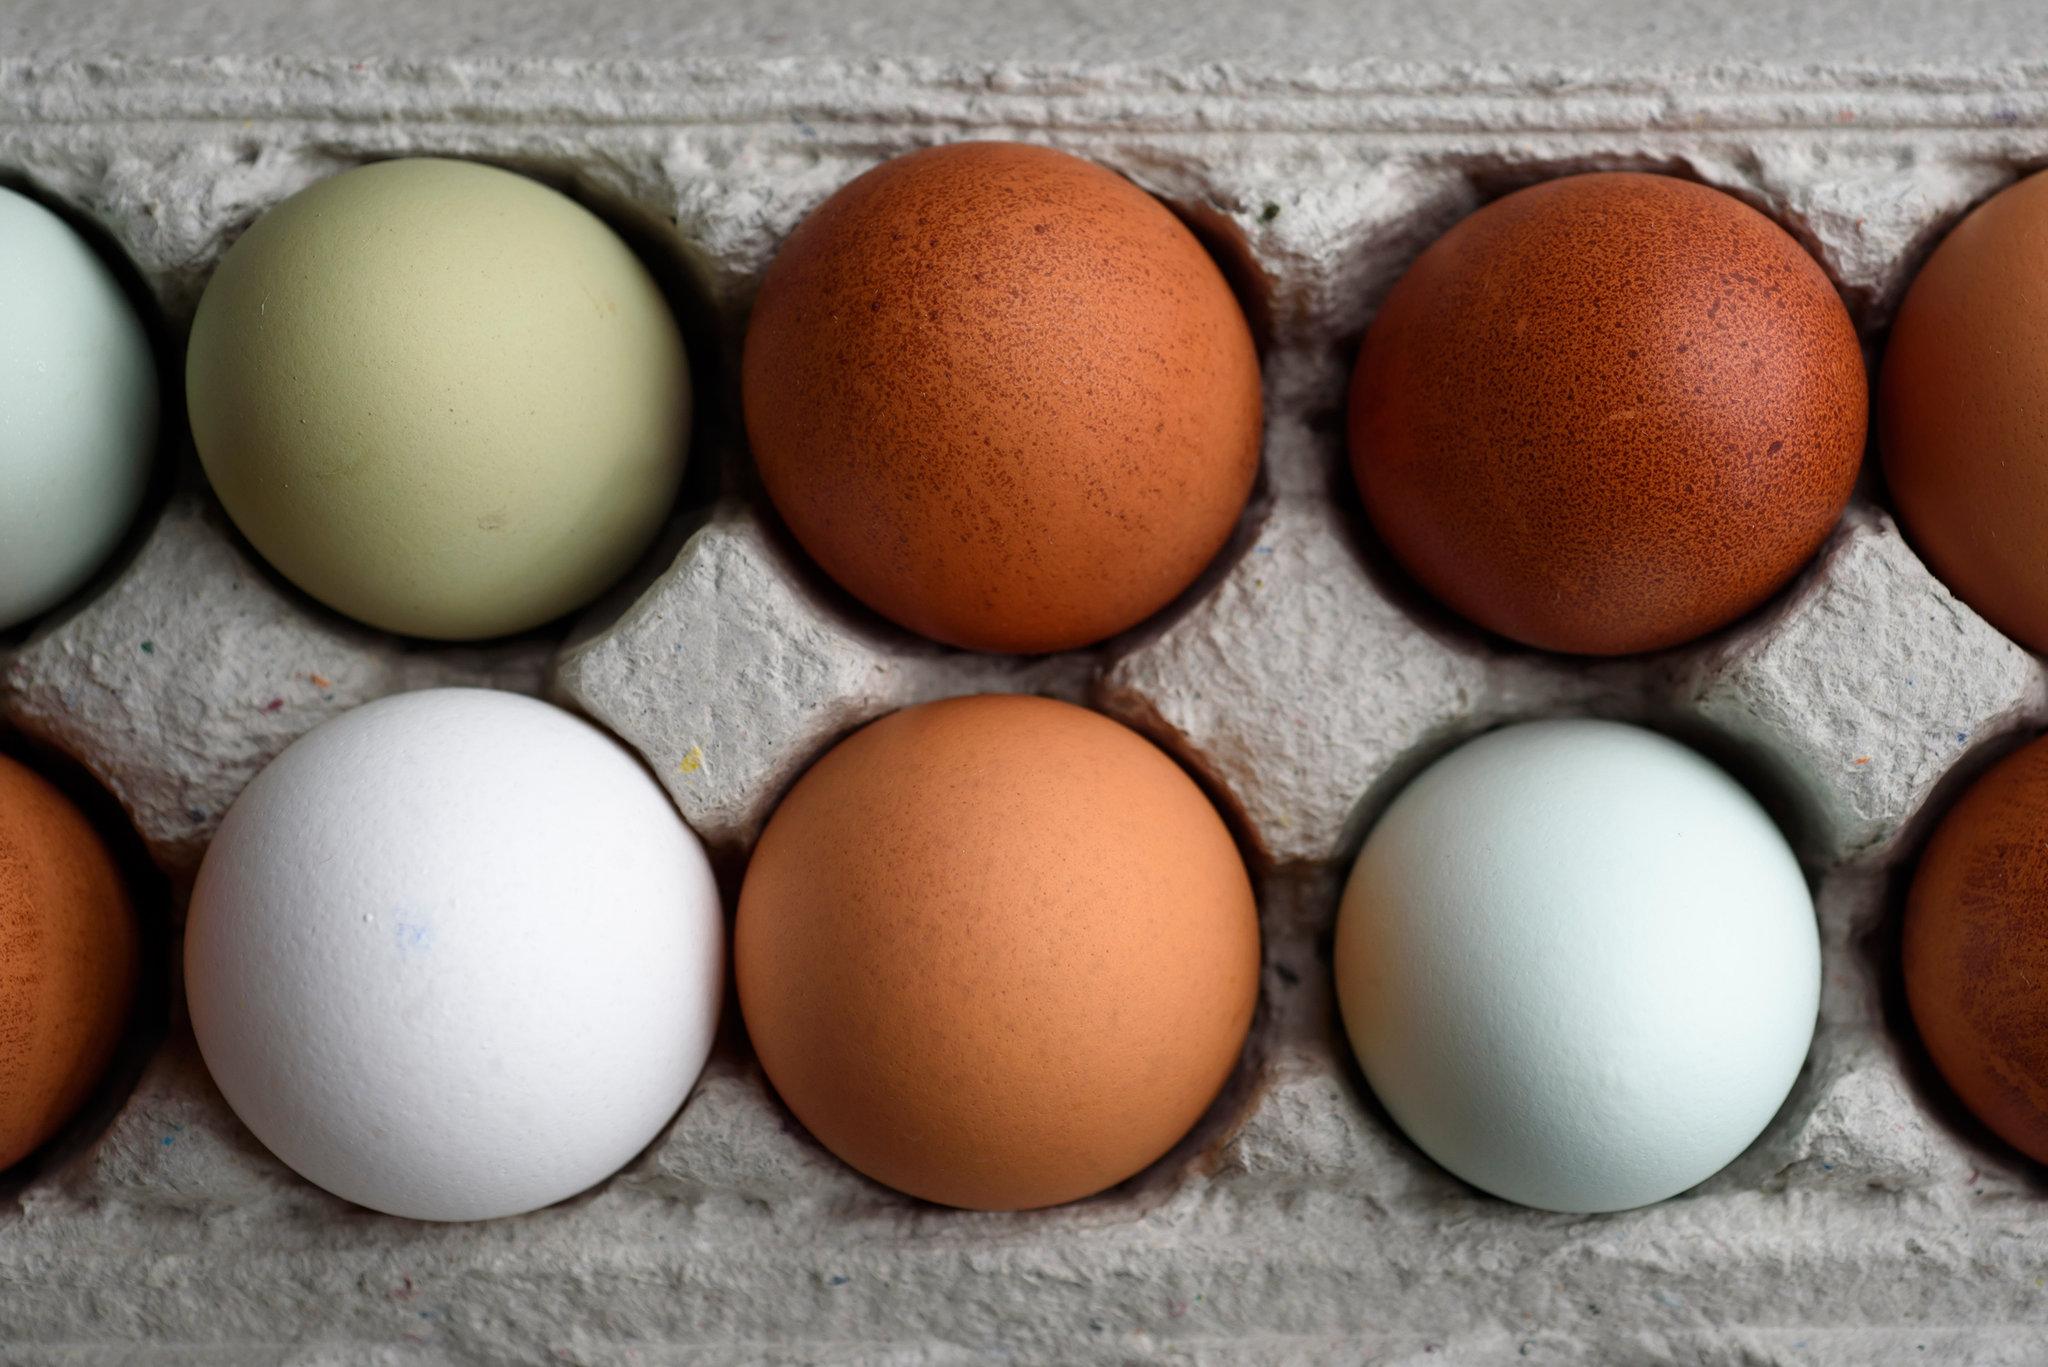 Recipe: How To Make Eggs